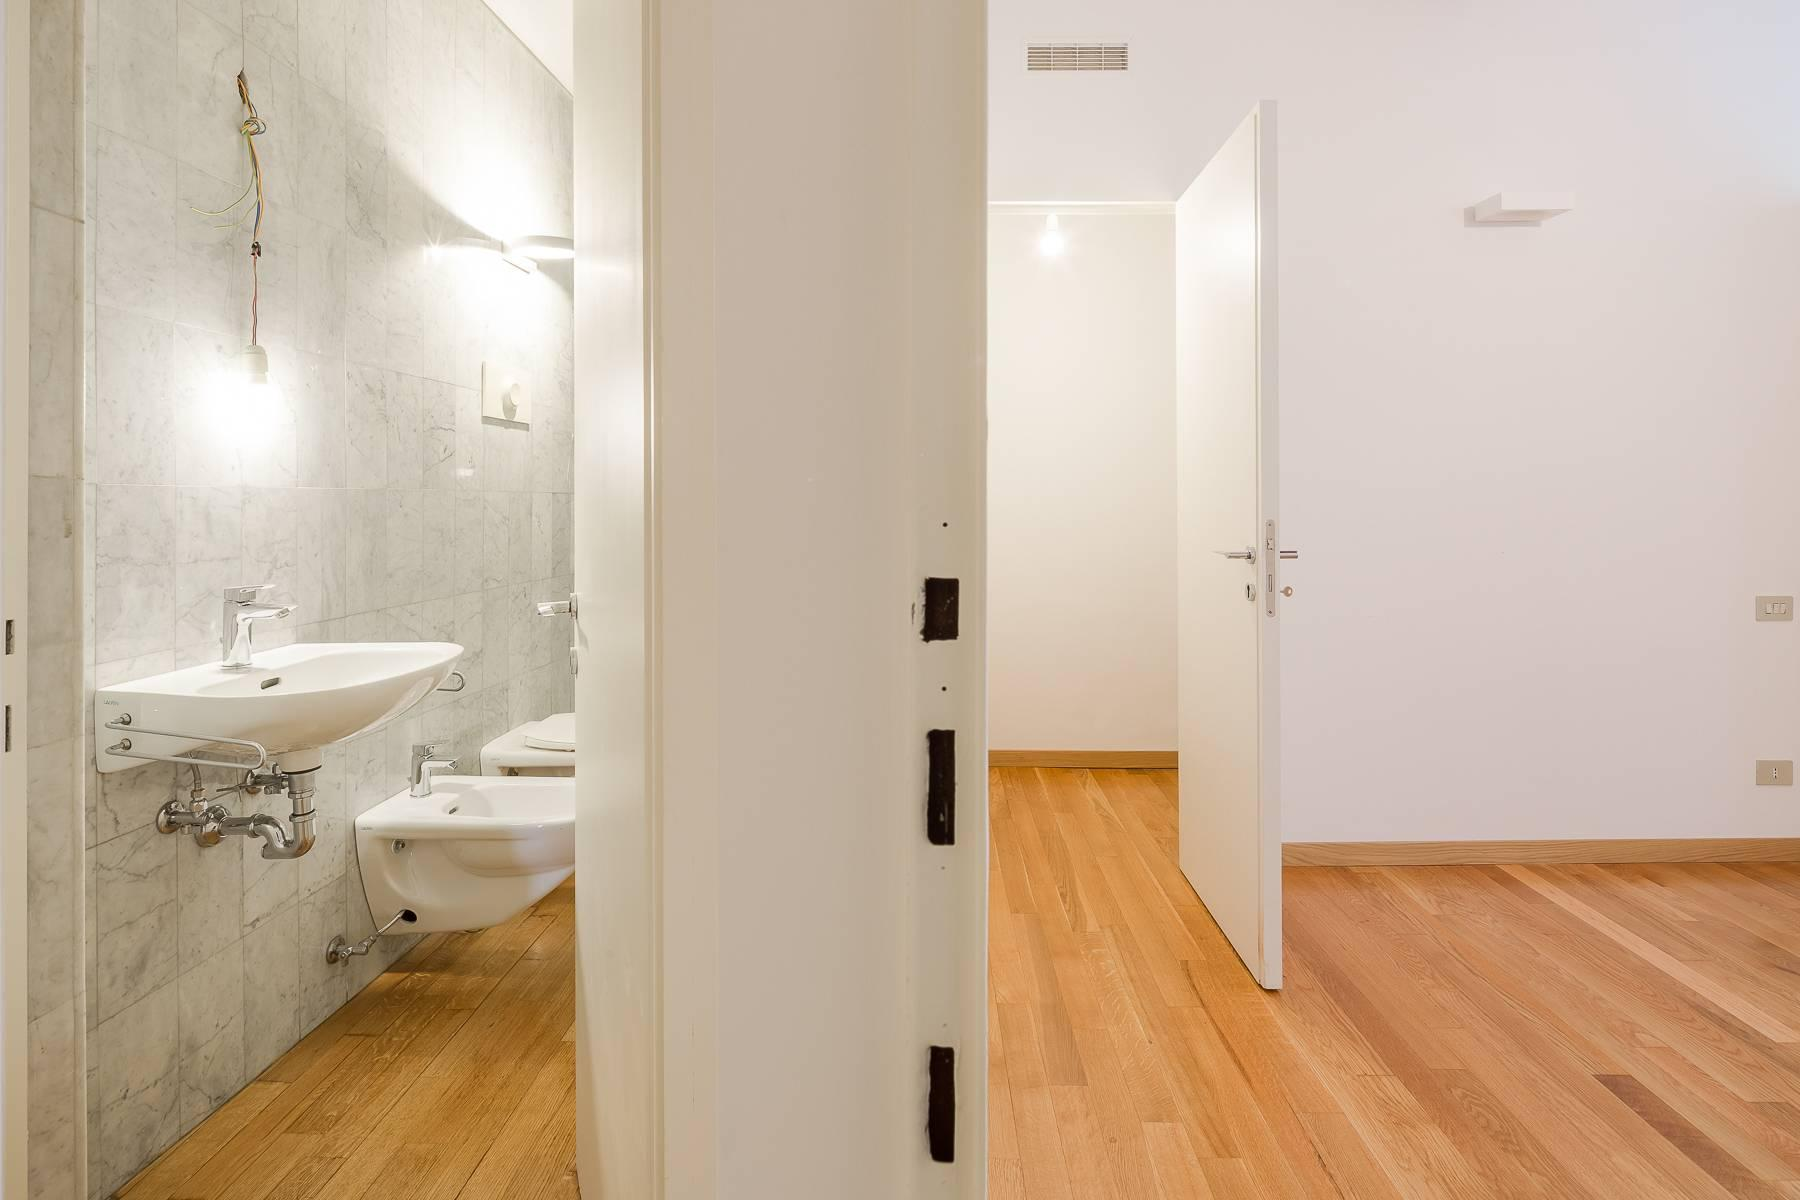 Apartment in an elegant period building located in a prestigious city district - 22